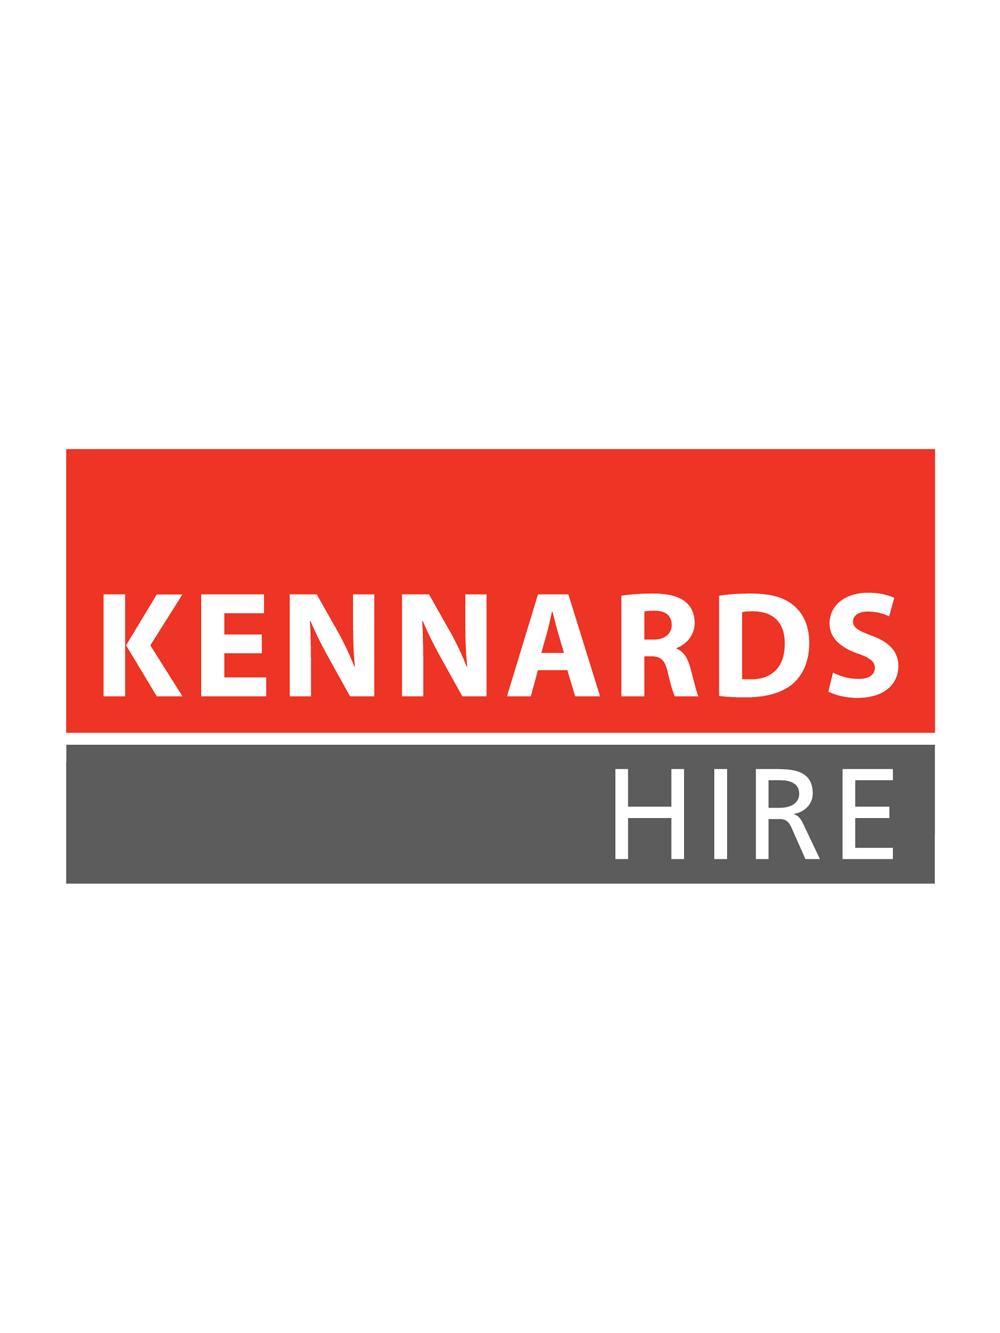 kennards_1000x1333.png